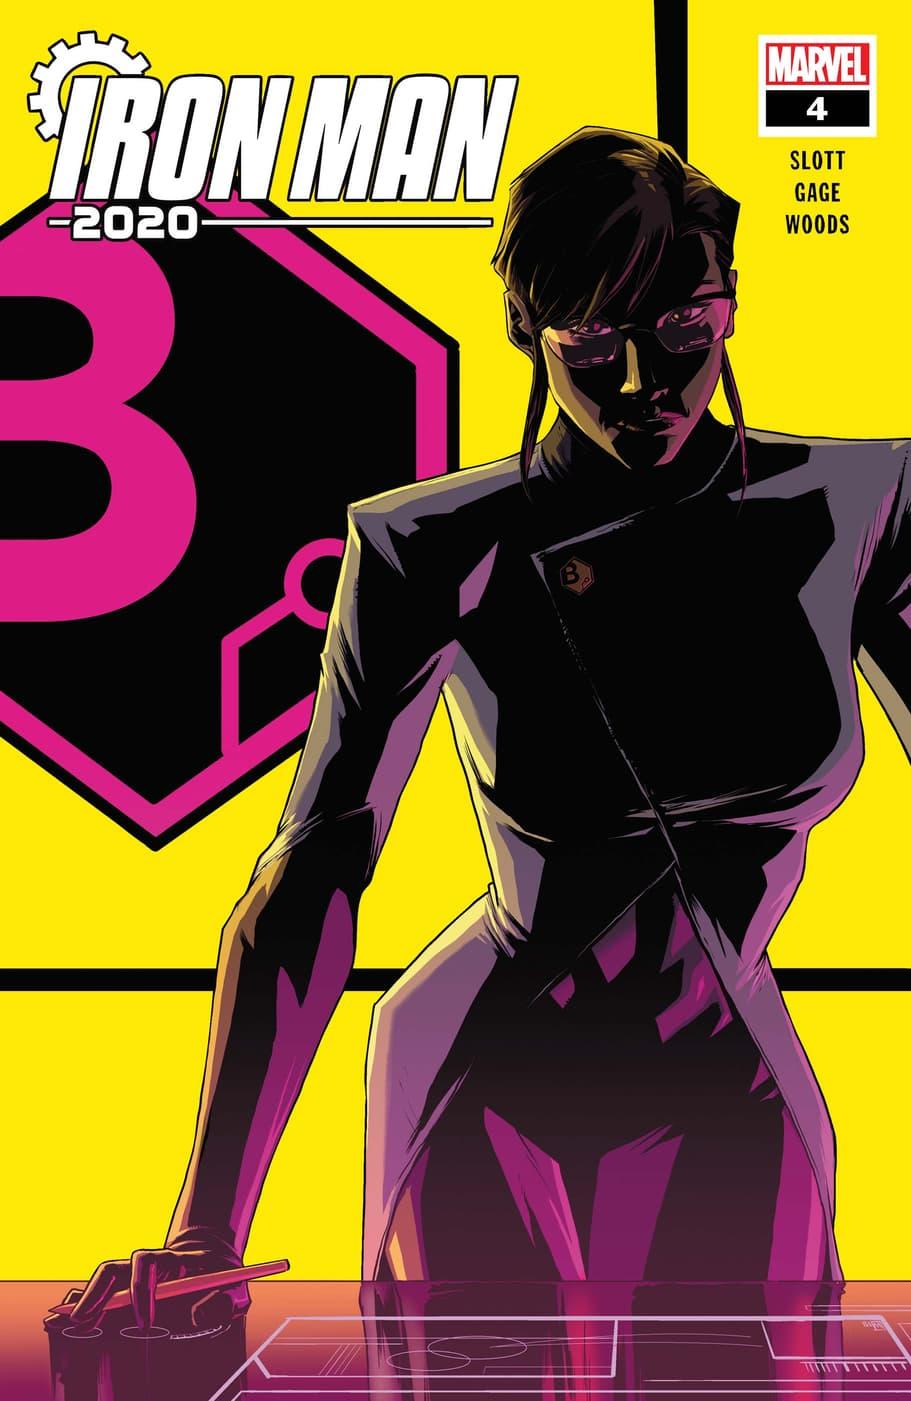 Iron Man 2020 #4 Main Cover